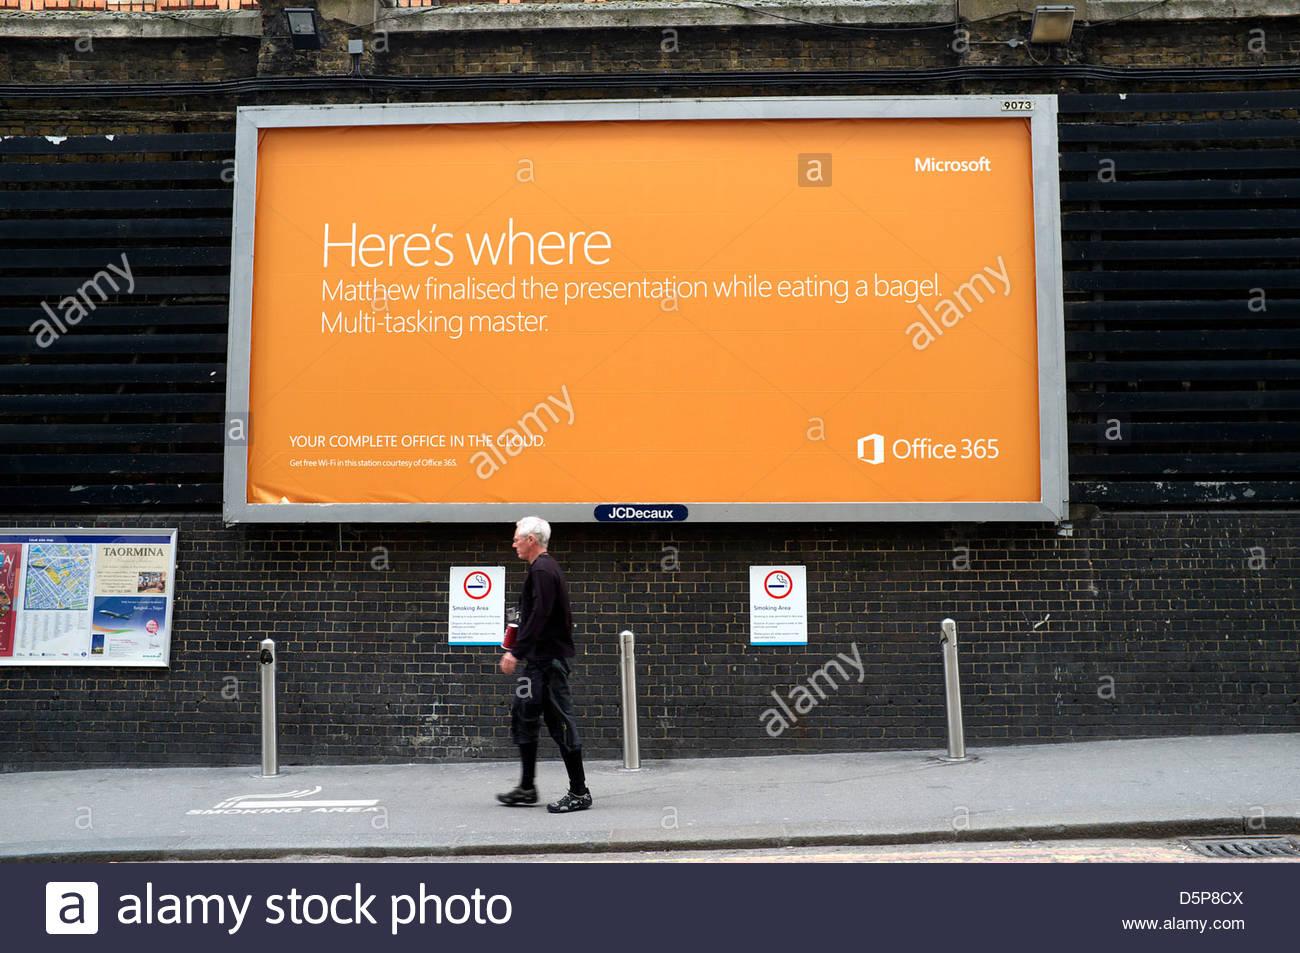 microsoft office advertising